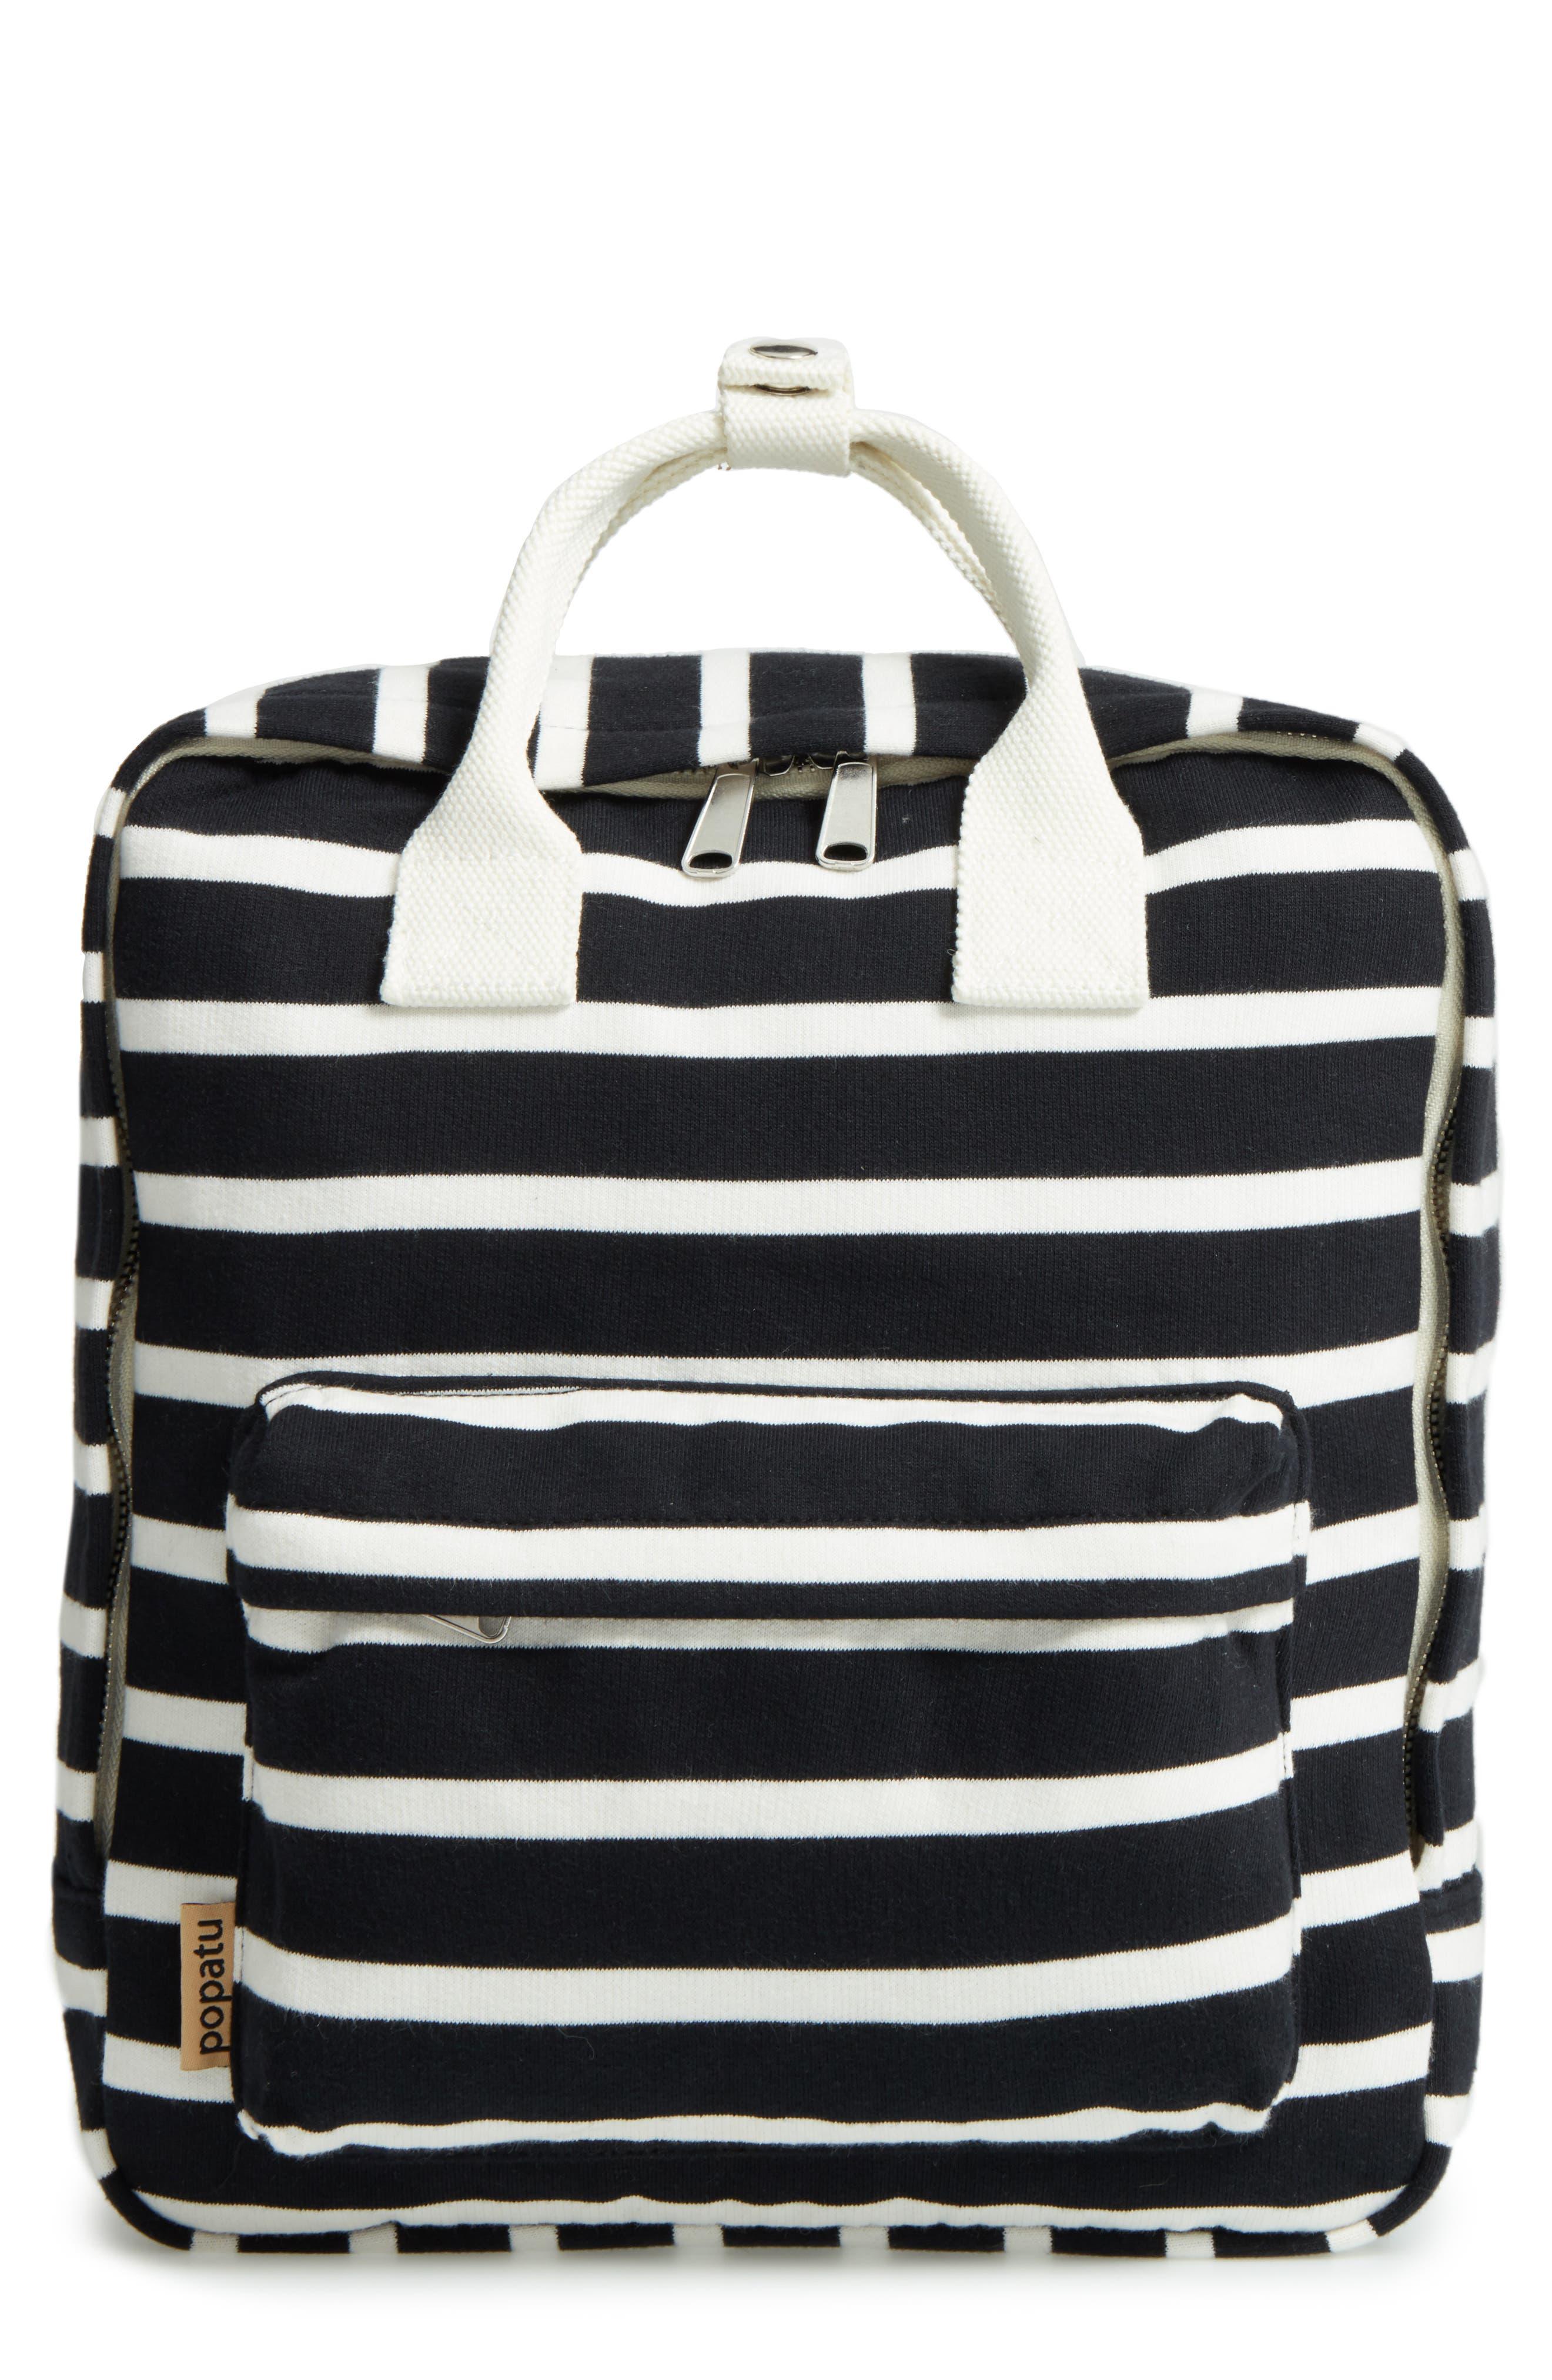 POPATU Stripe Jersey Knit Backpack